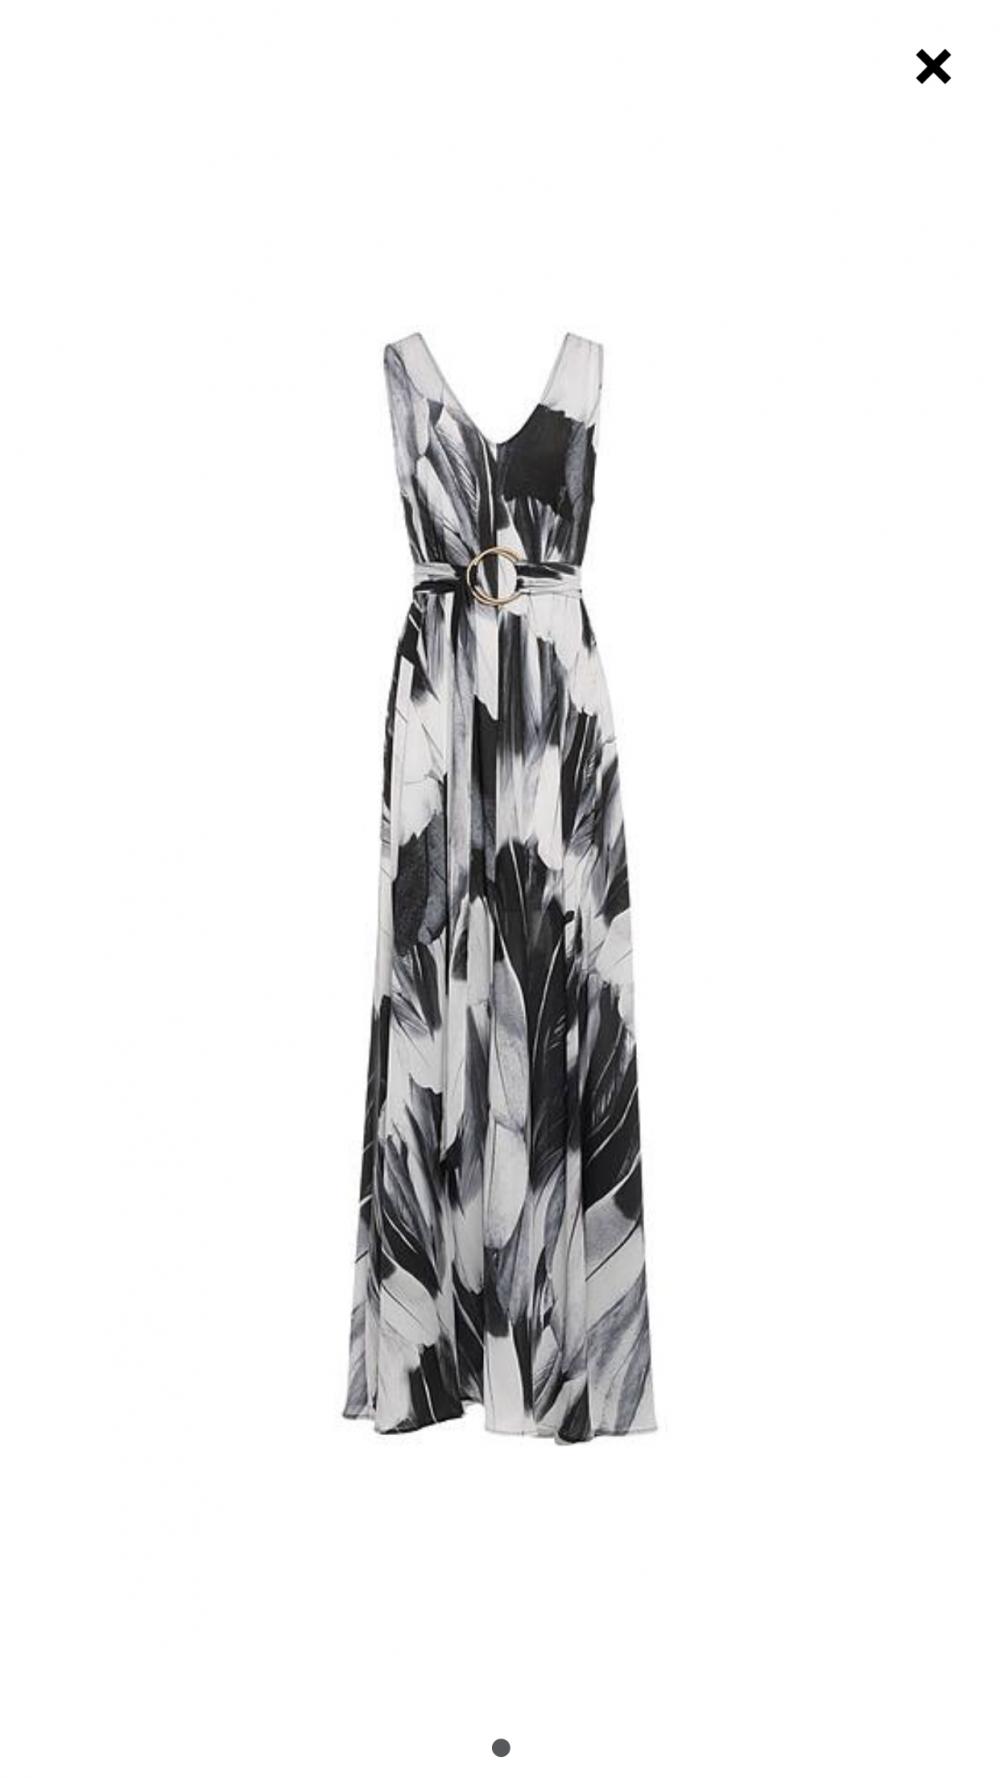 Платье сарафан Maesta размер 46-48